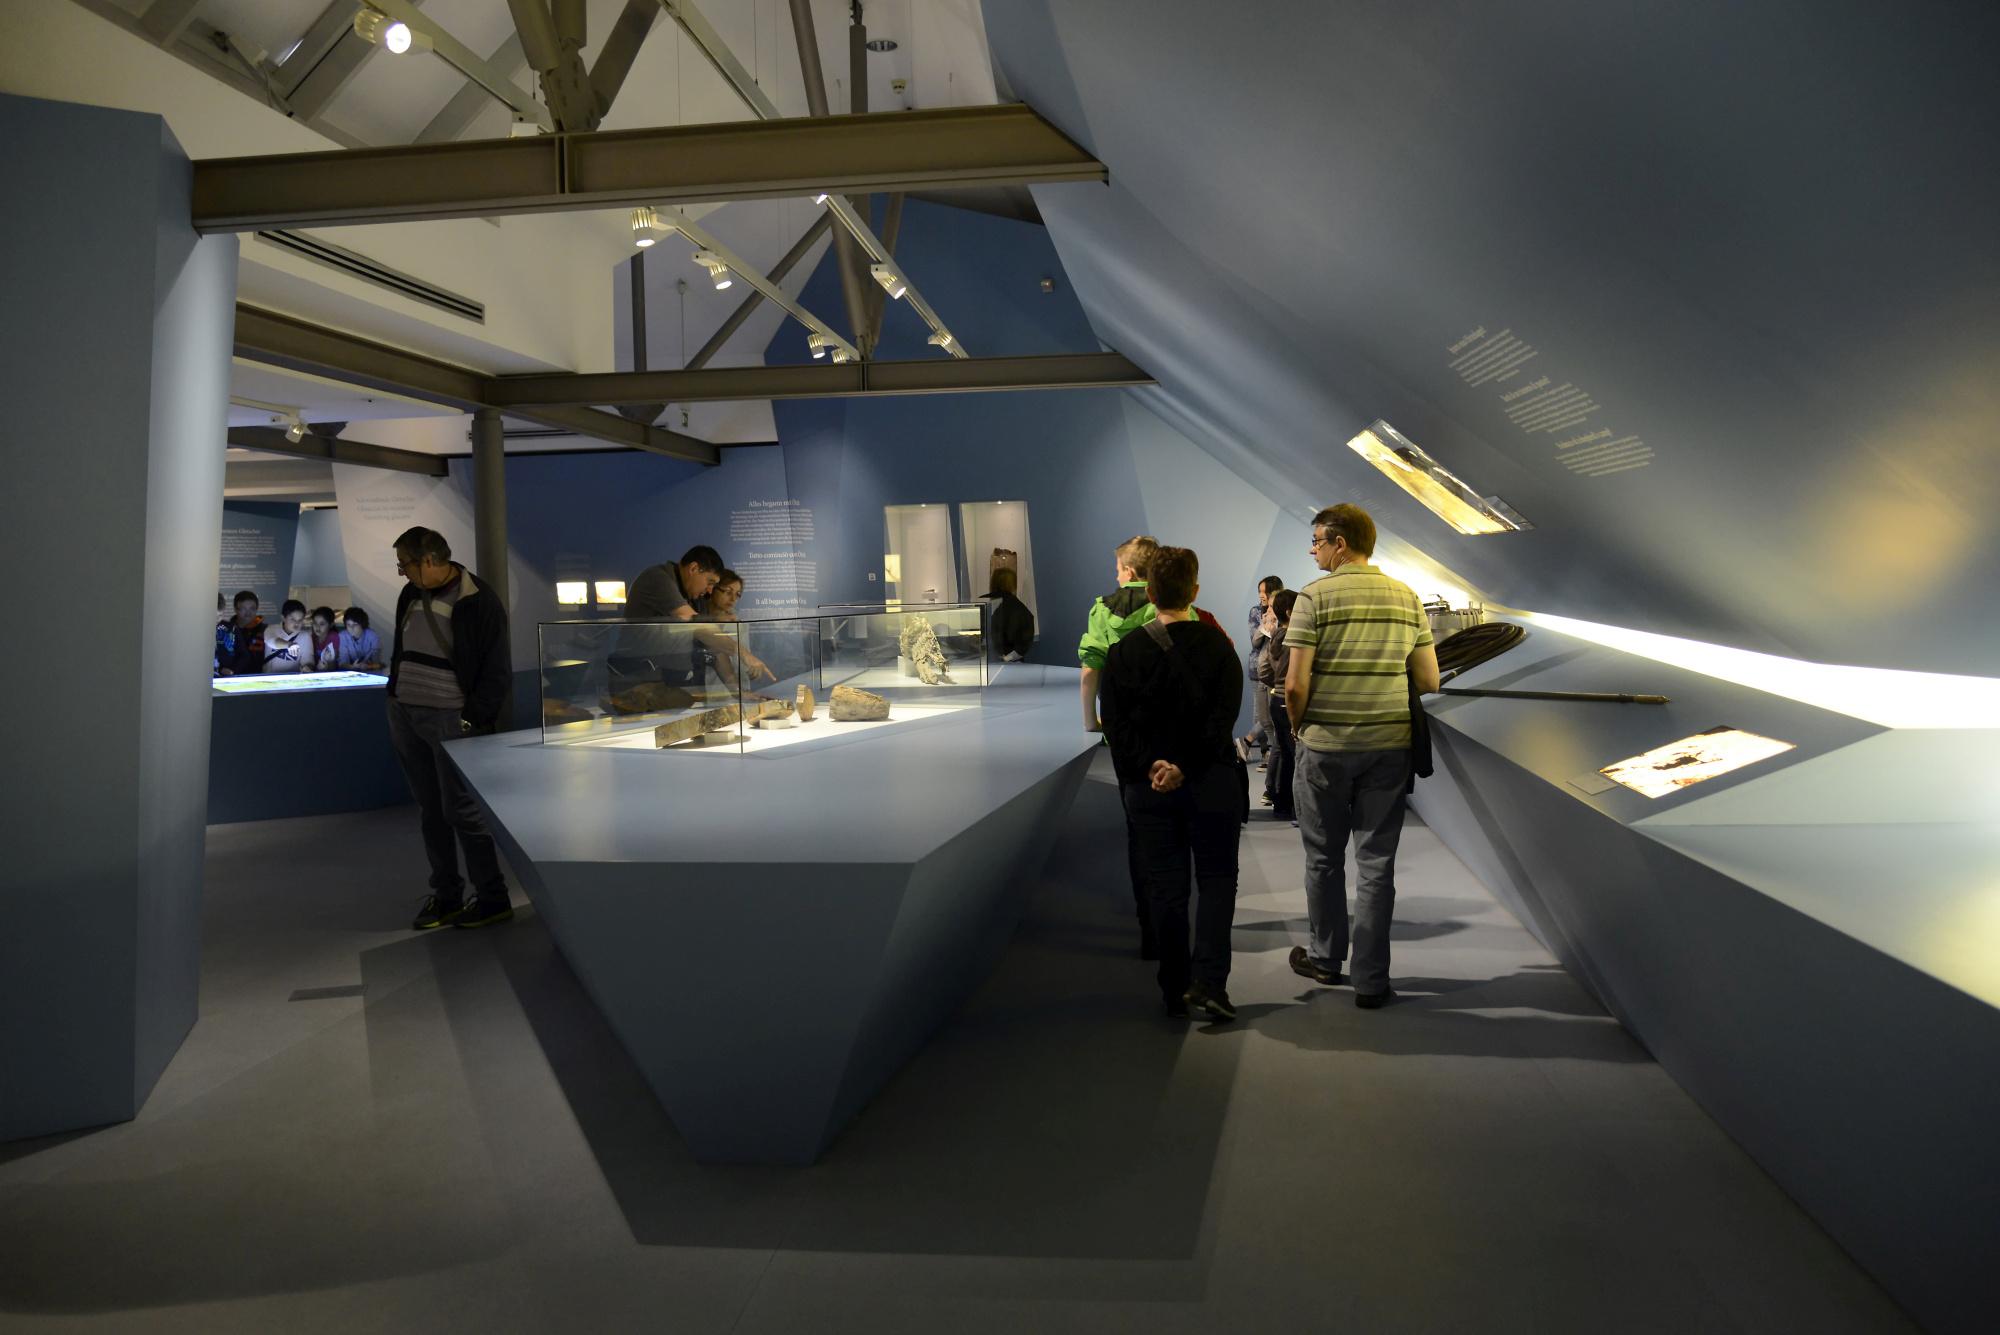 Bolzano museum bolzano pictures geography im for Cine museum bolzano